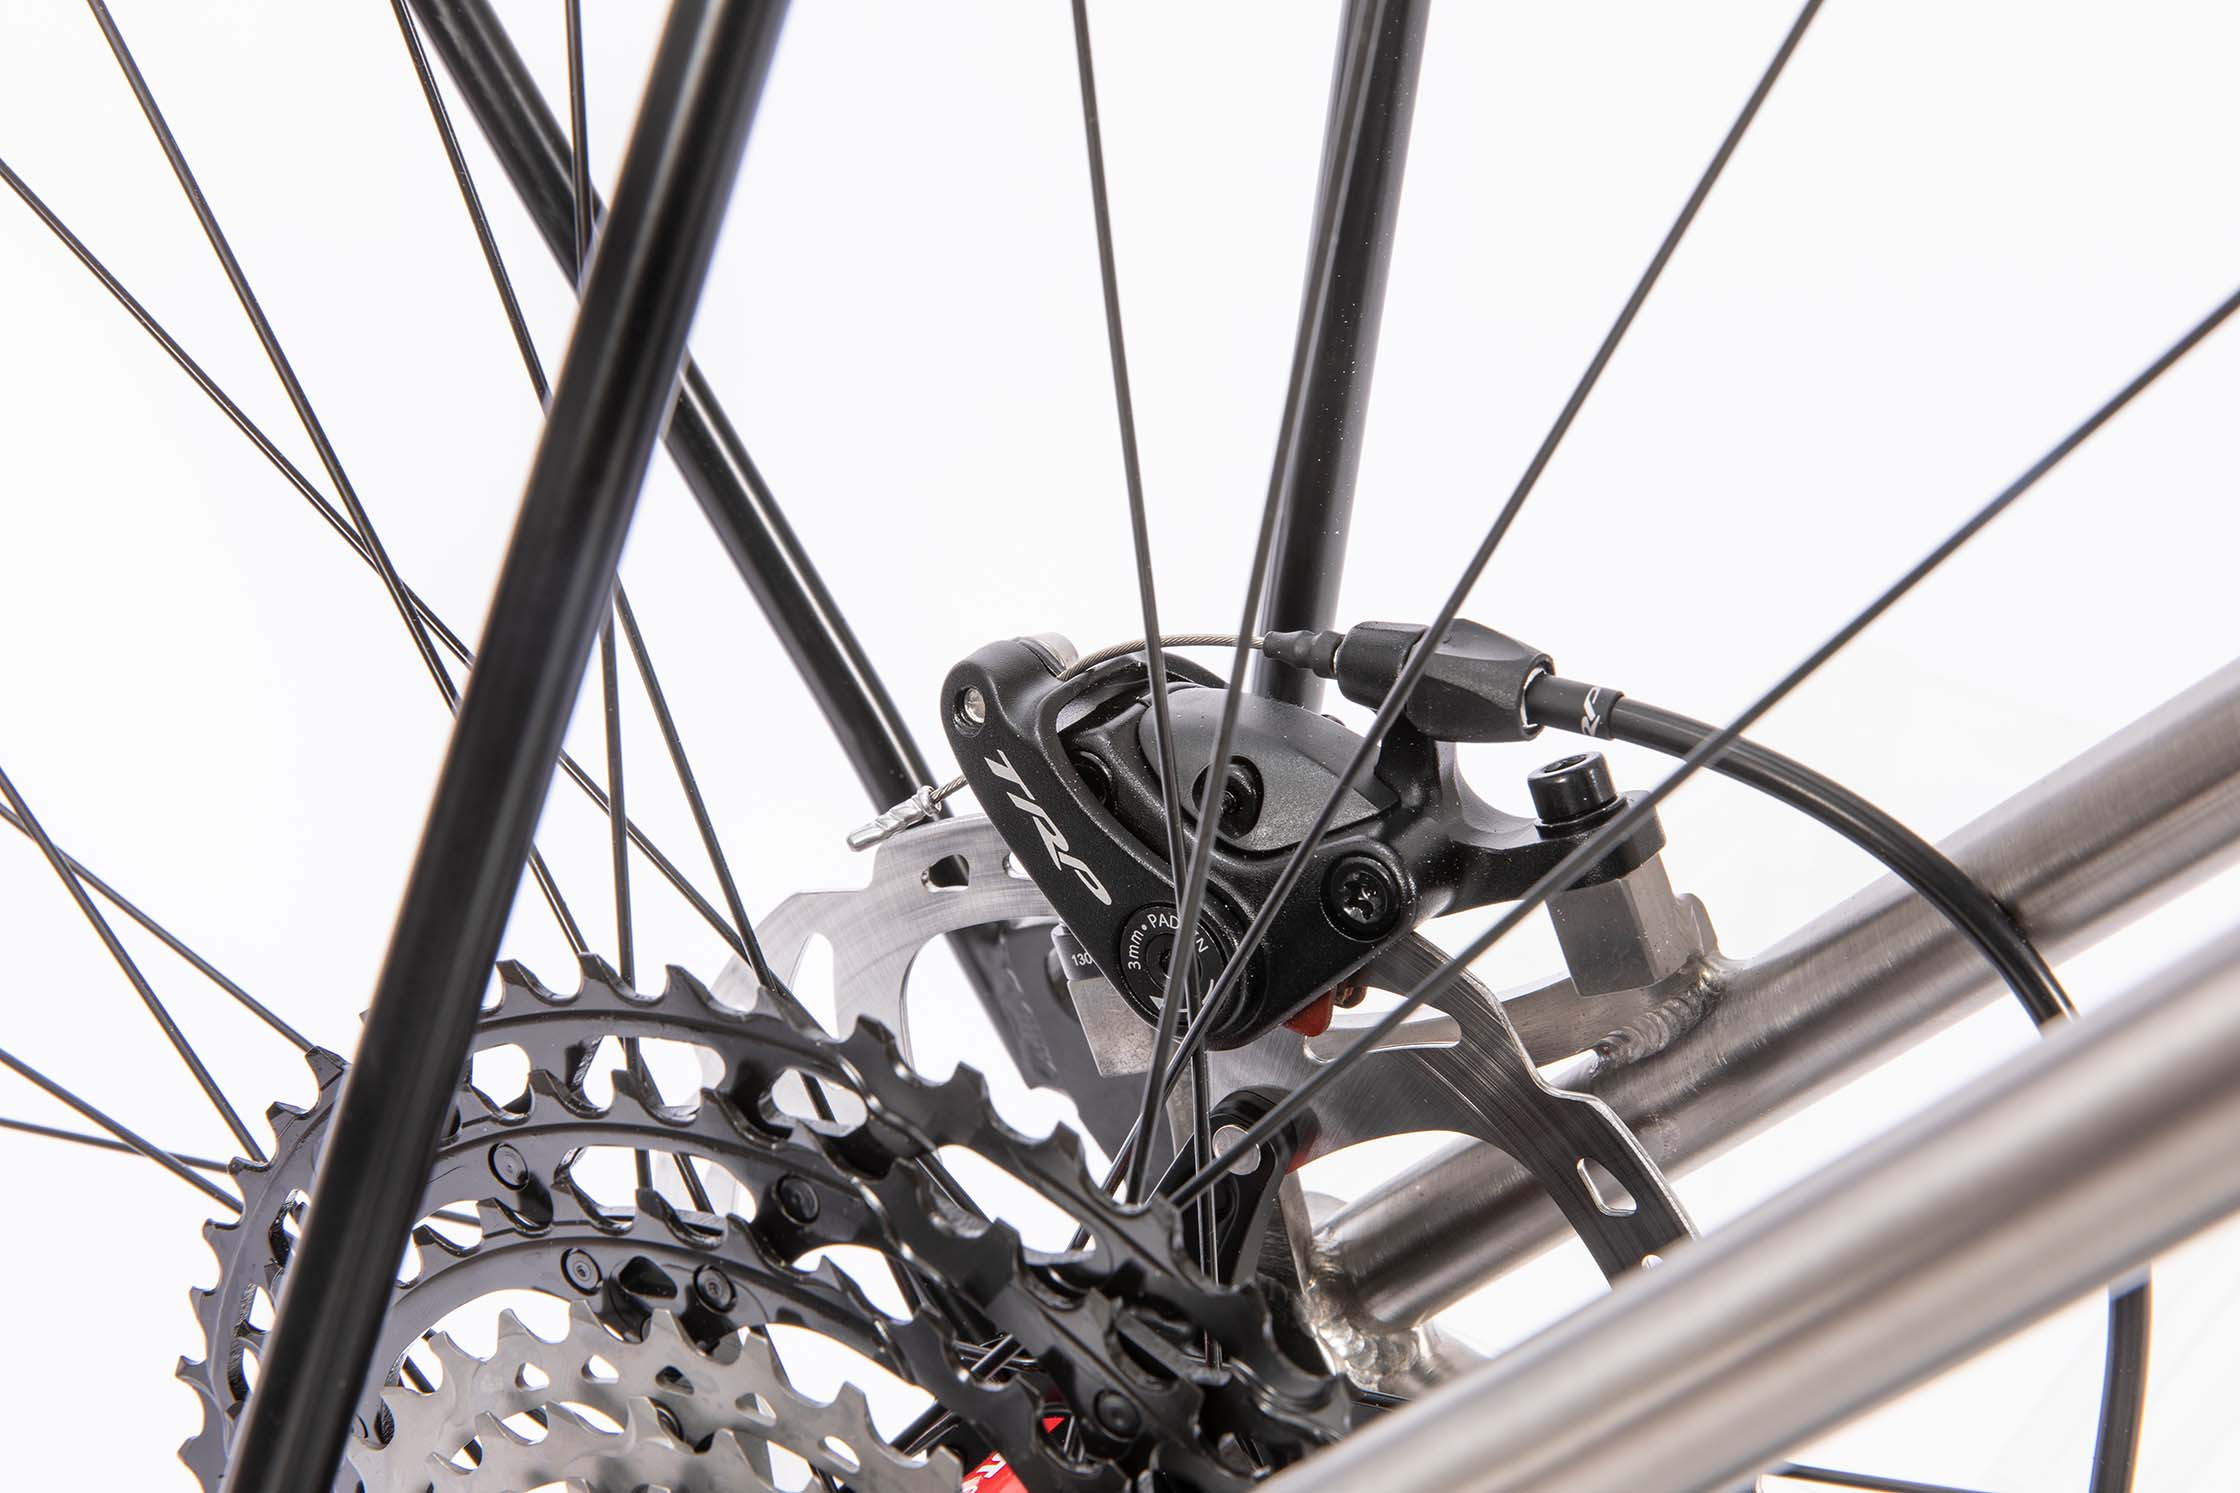 Mass Titan Mountainbike Hardtail für Bike Adventure Touren_8